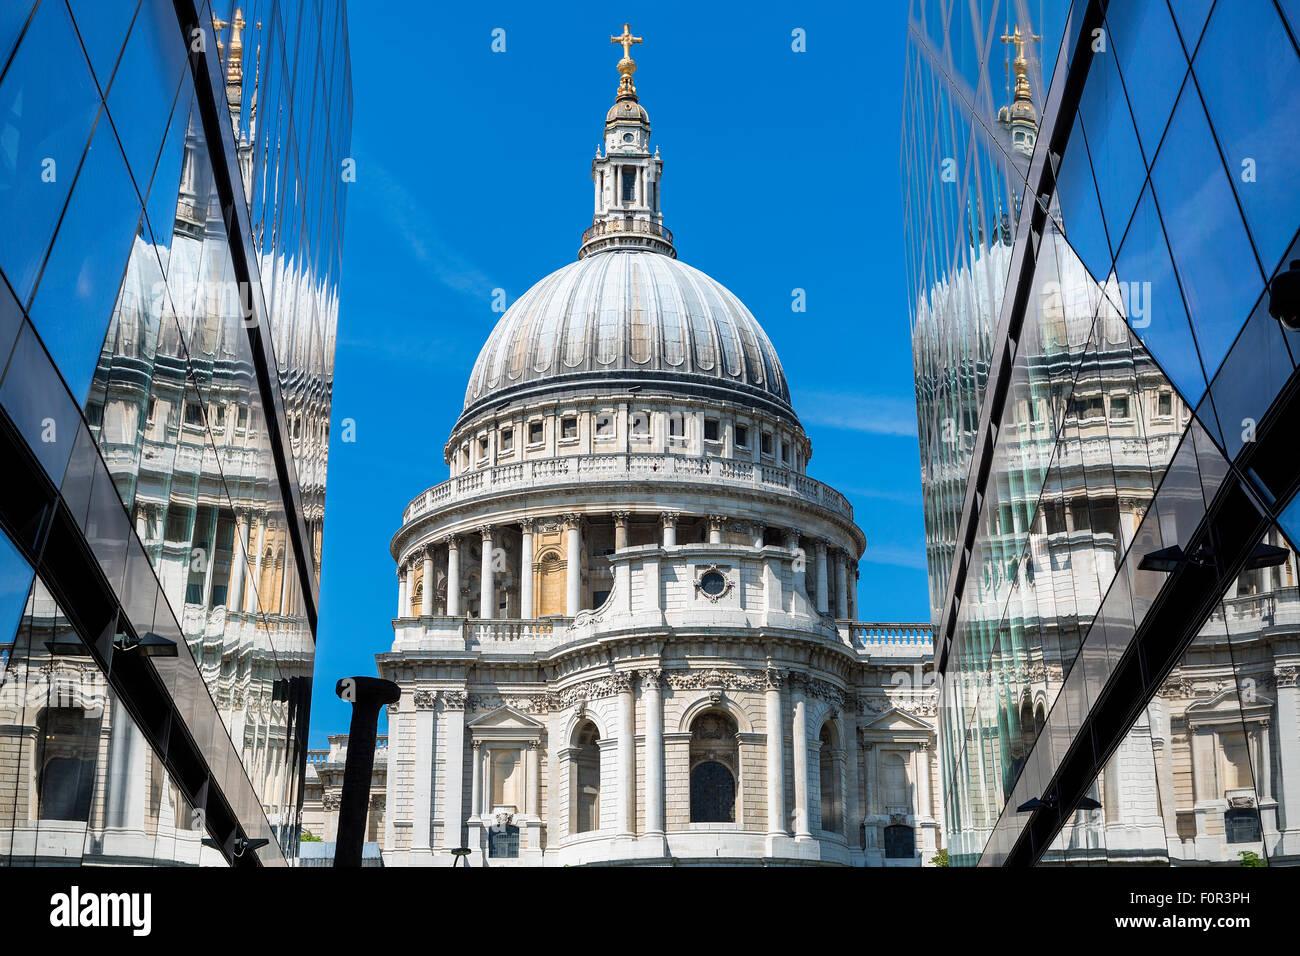 England, London, St. Pauls Cathedral Stockbild